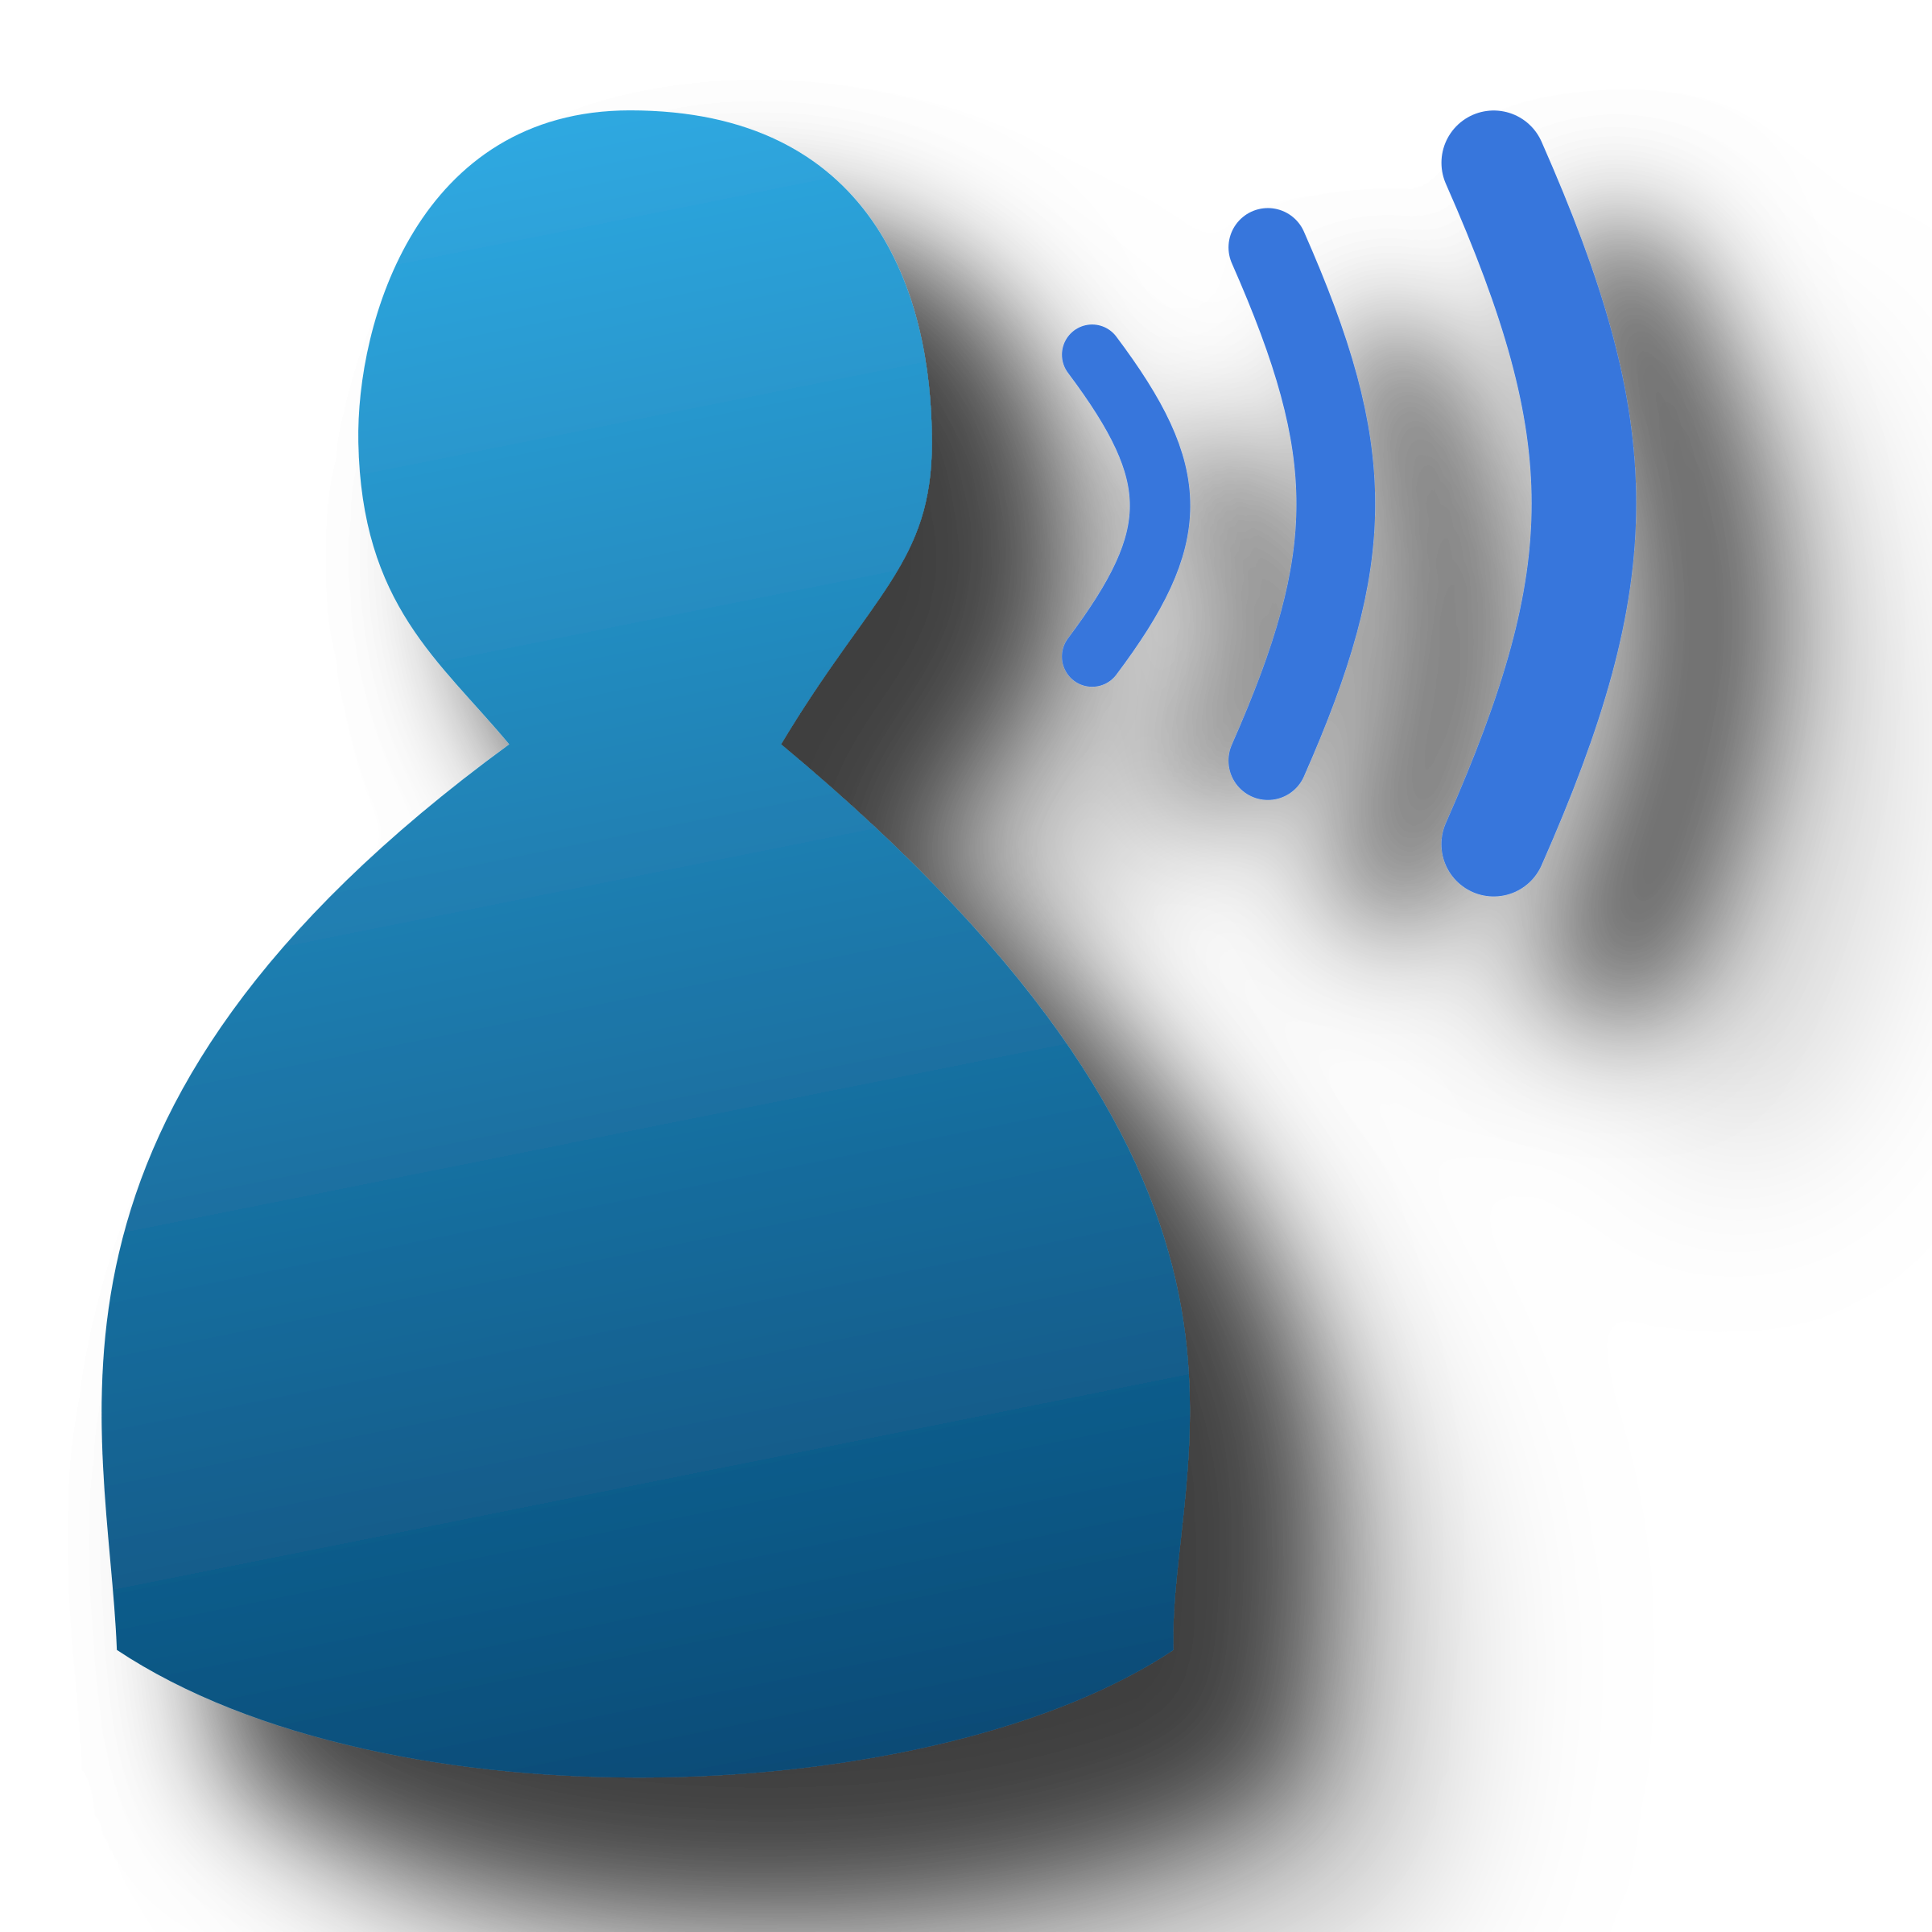 Big image png. Voice clipart